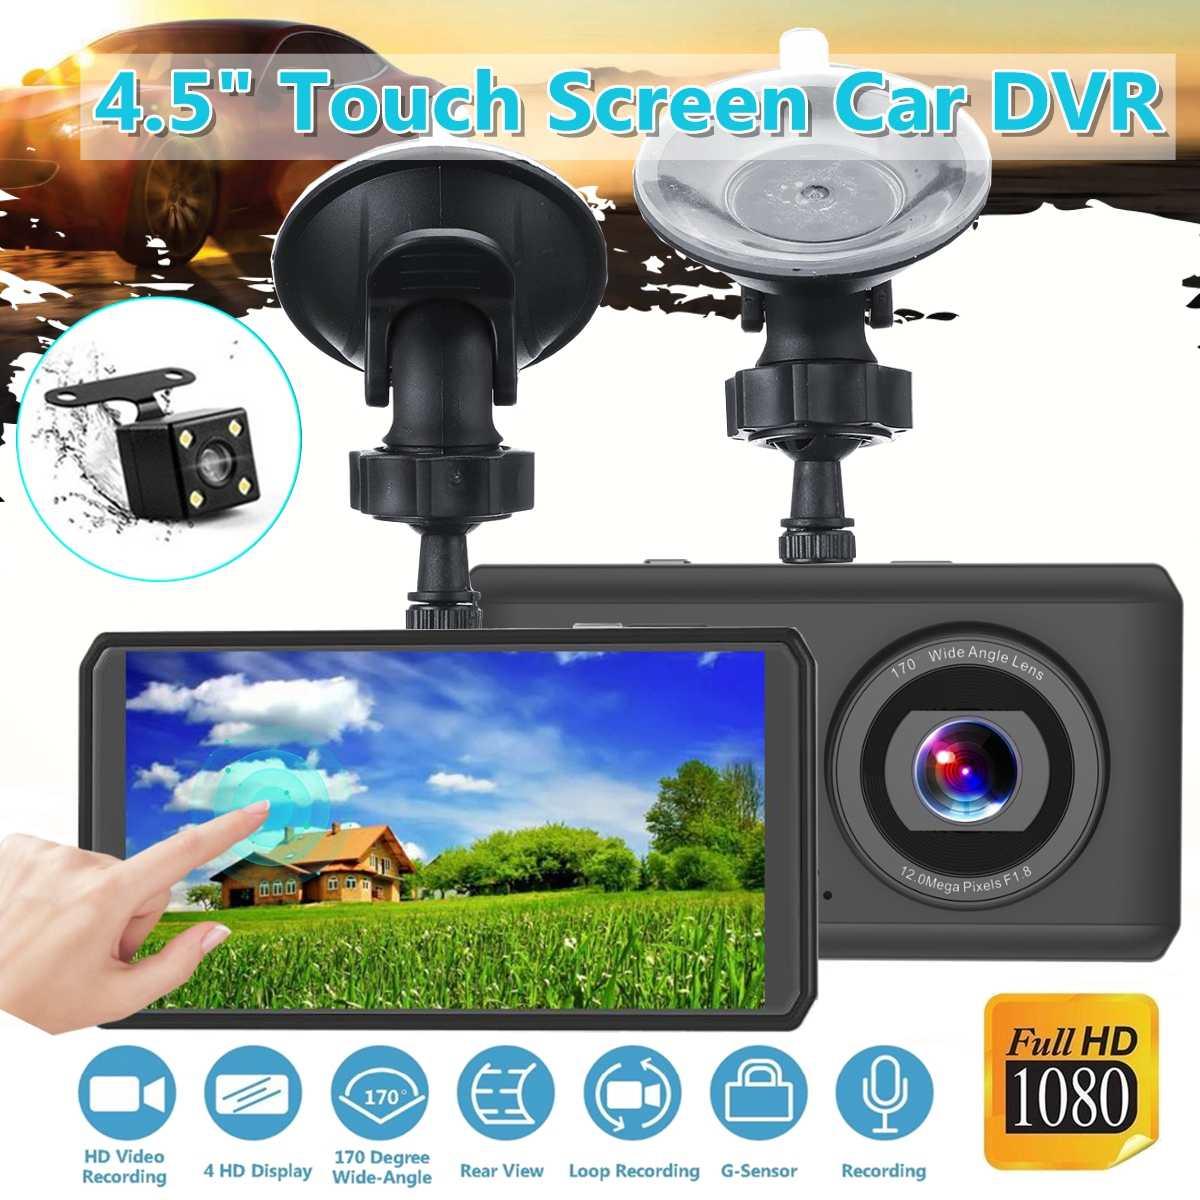 KROAK 1080P 4.5 inch FHD Car DVR Black Dashboard Night Vision Camera Video touching screen Recorder Loop Recording Mini Dash